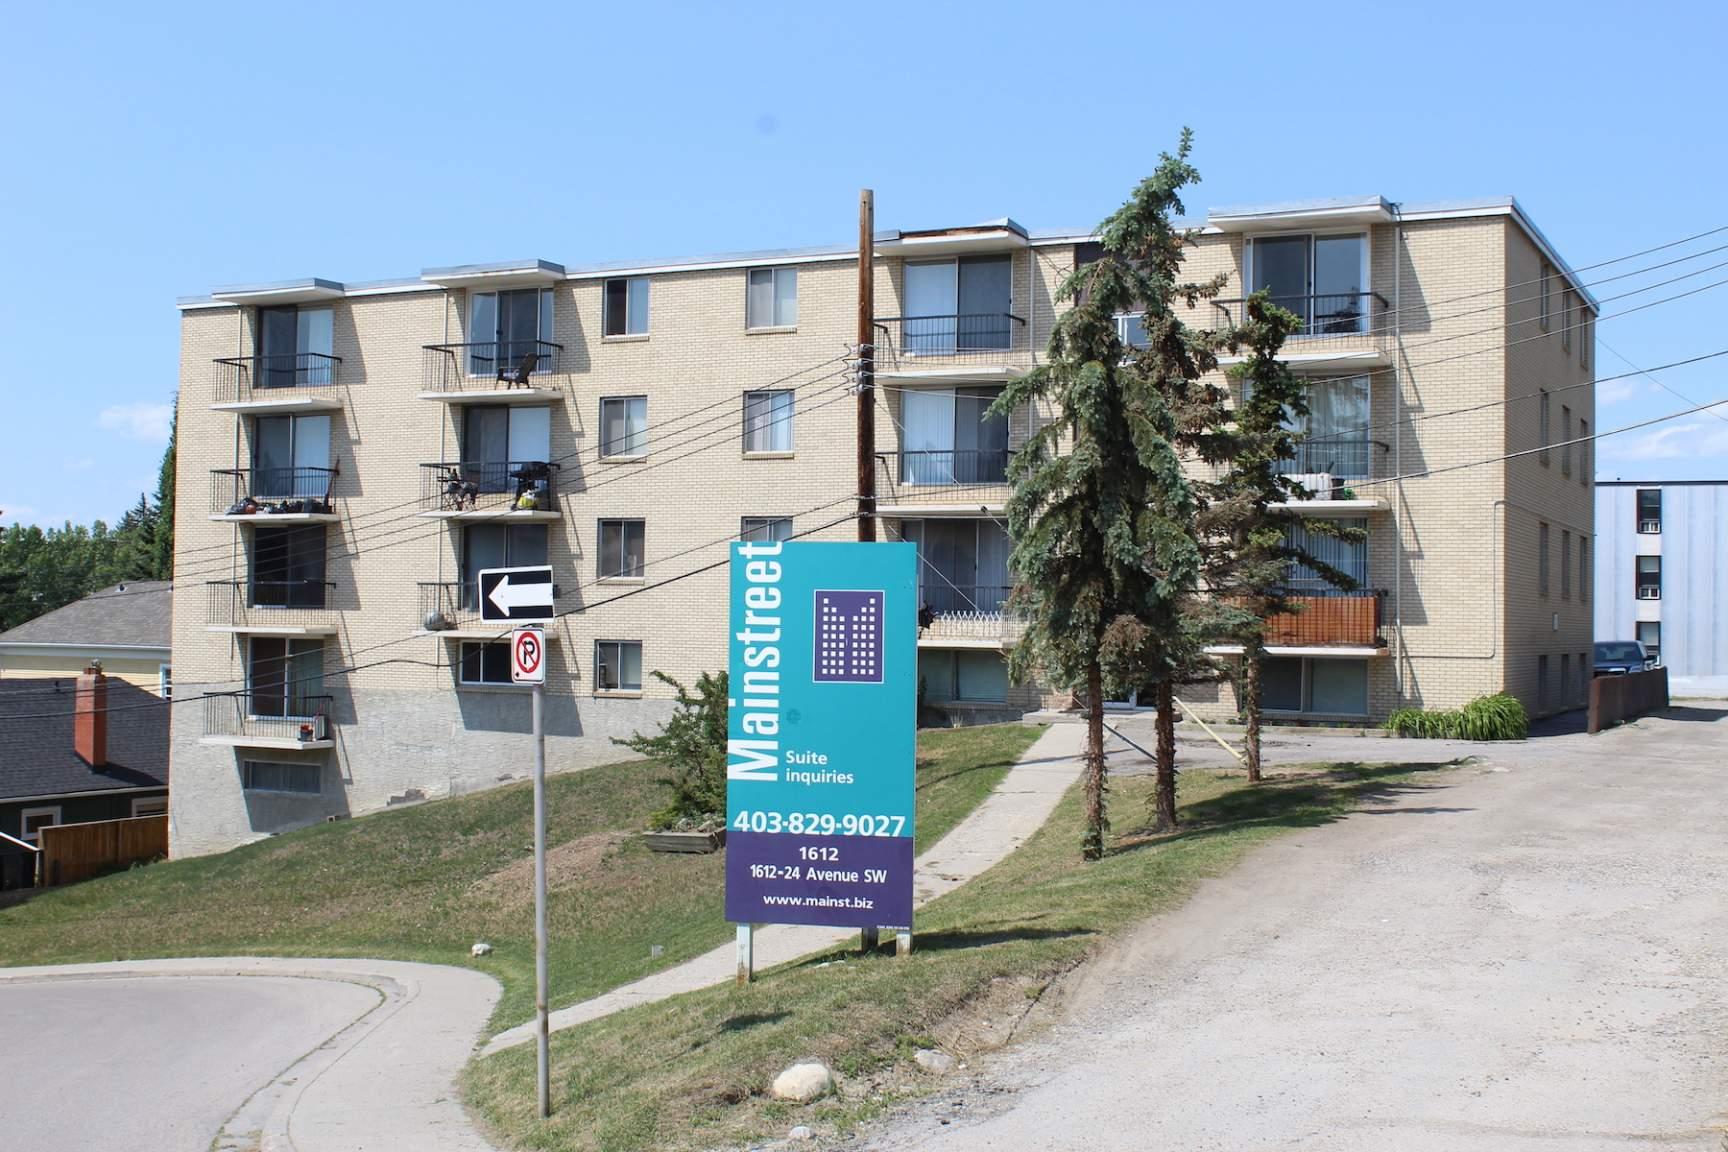 1612 24 Avenue SW, Calgary, AB - $1,150 CAD/ month